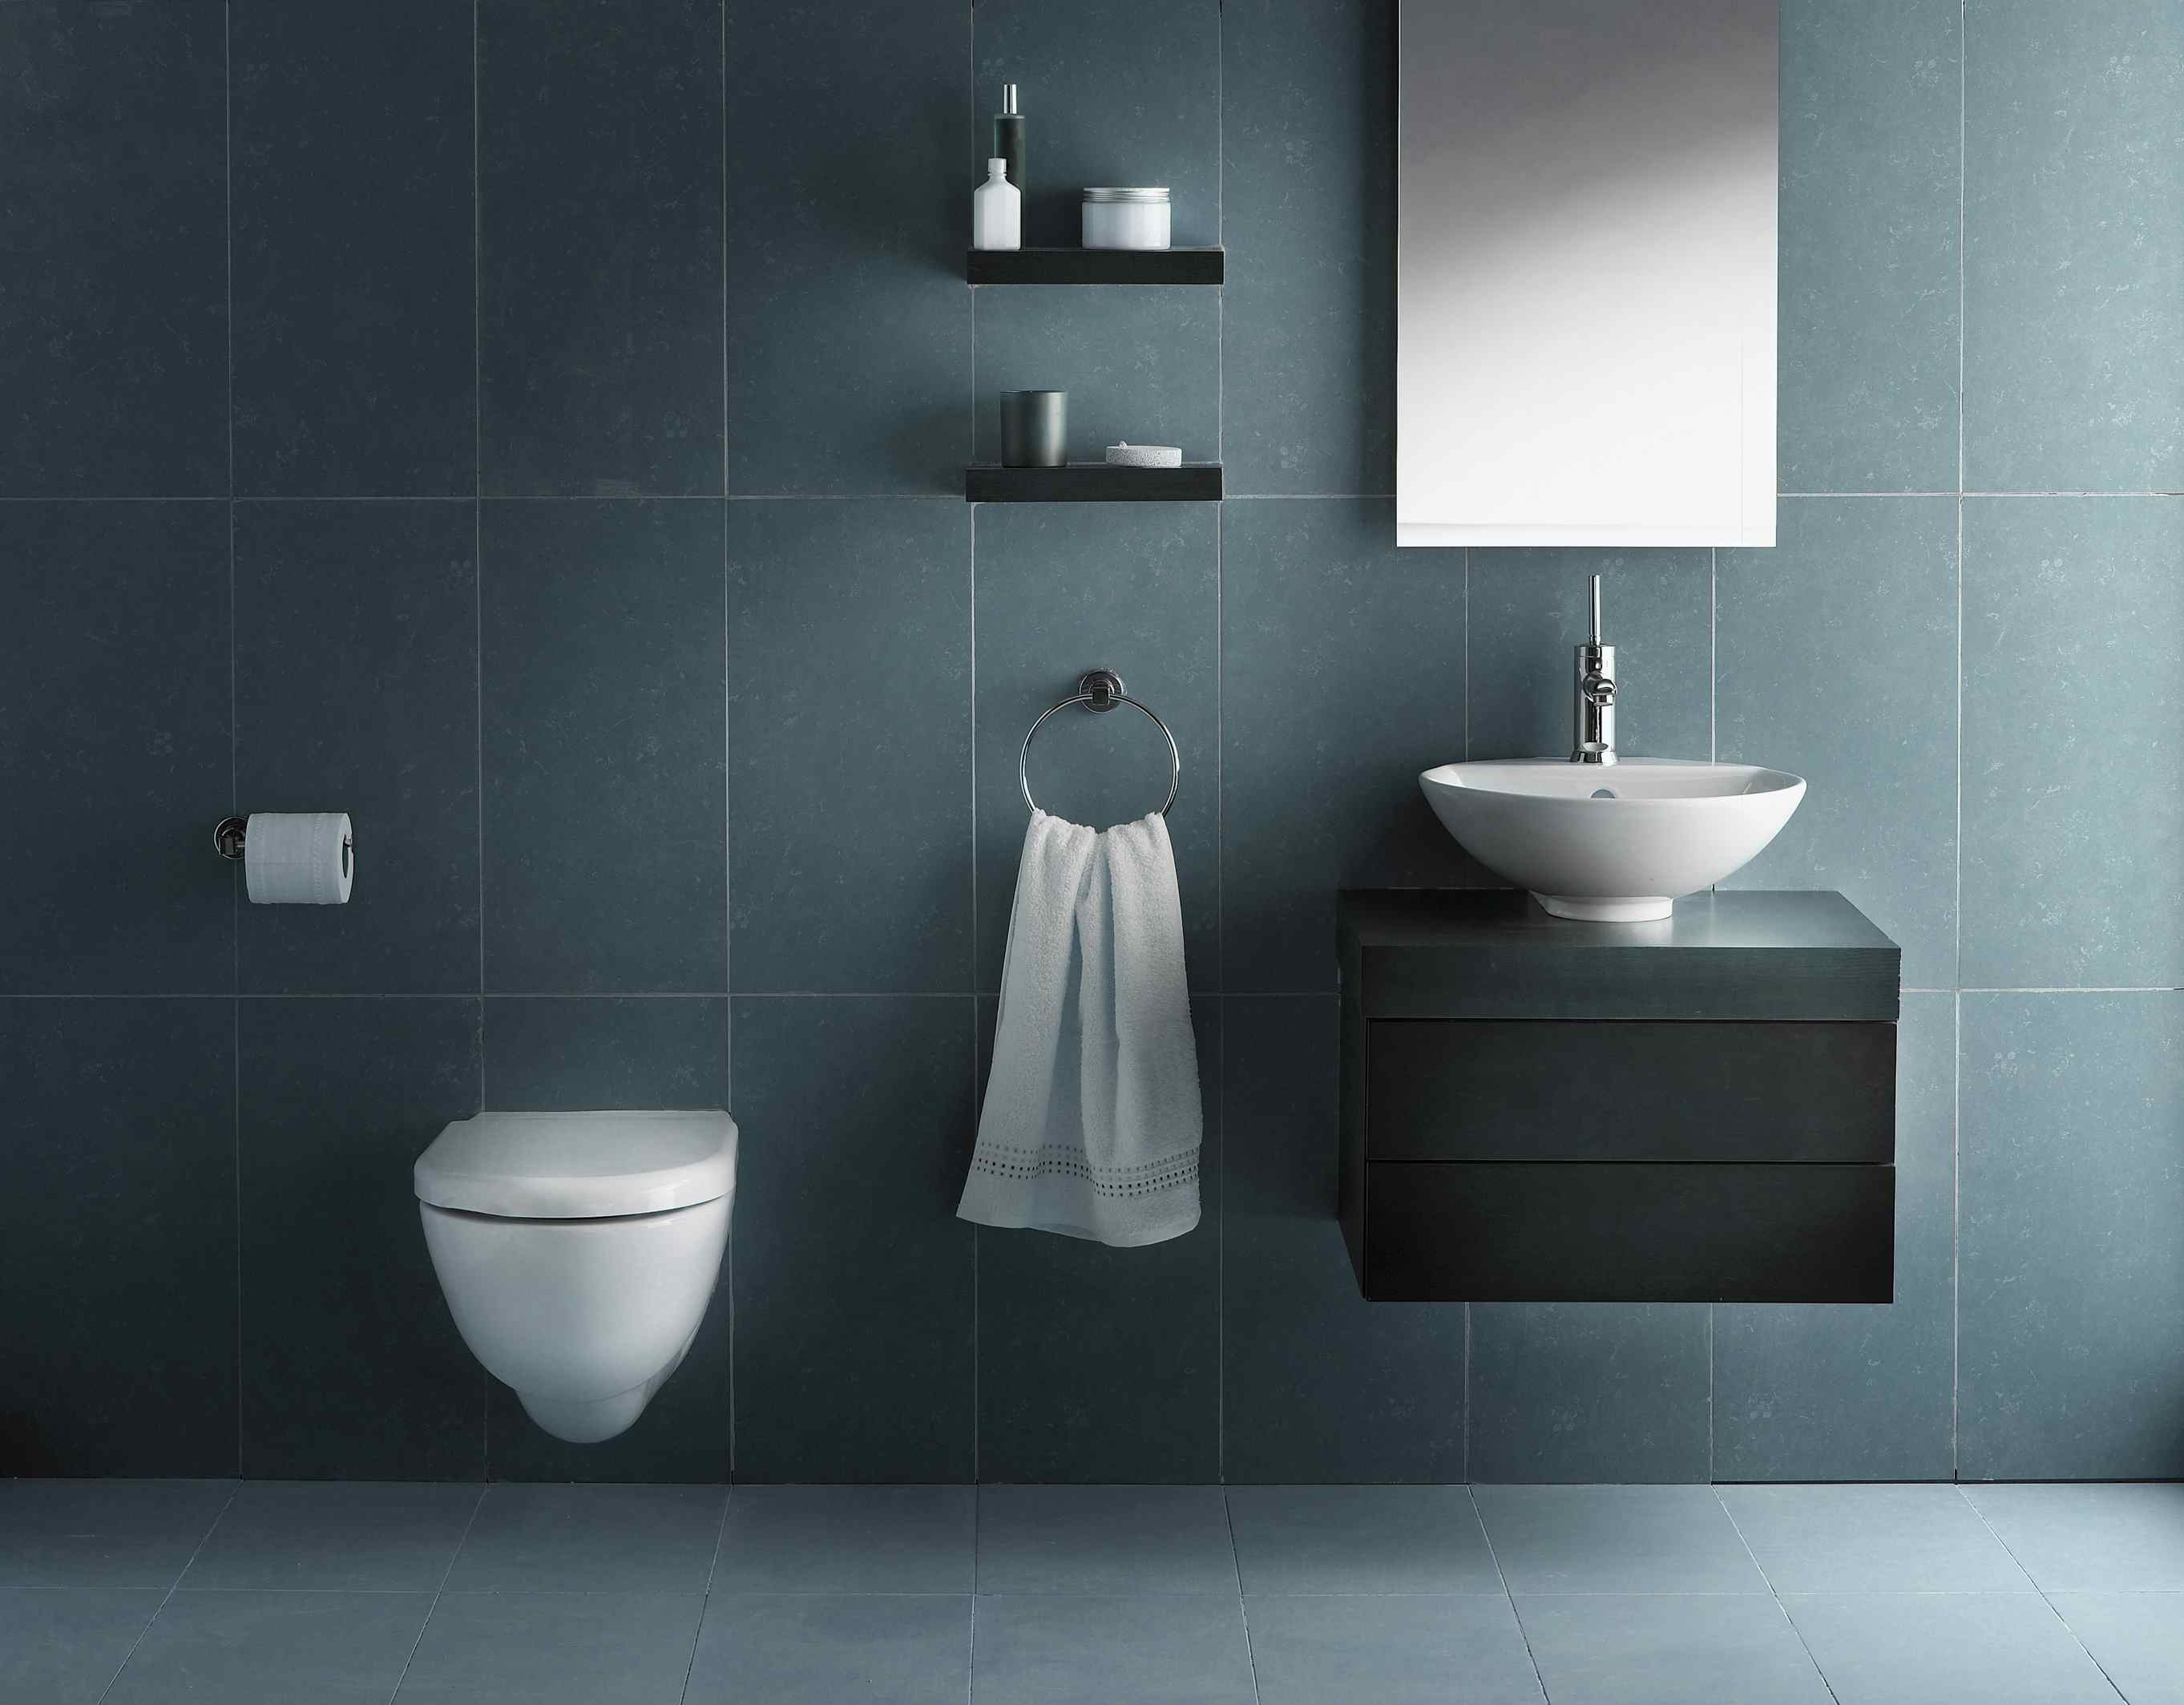 Interior of bathroom in cold tone